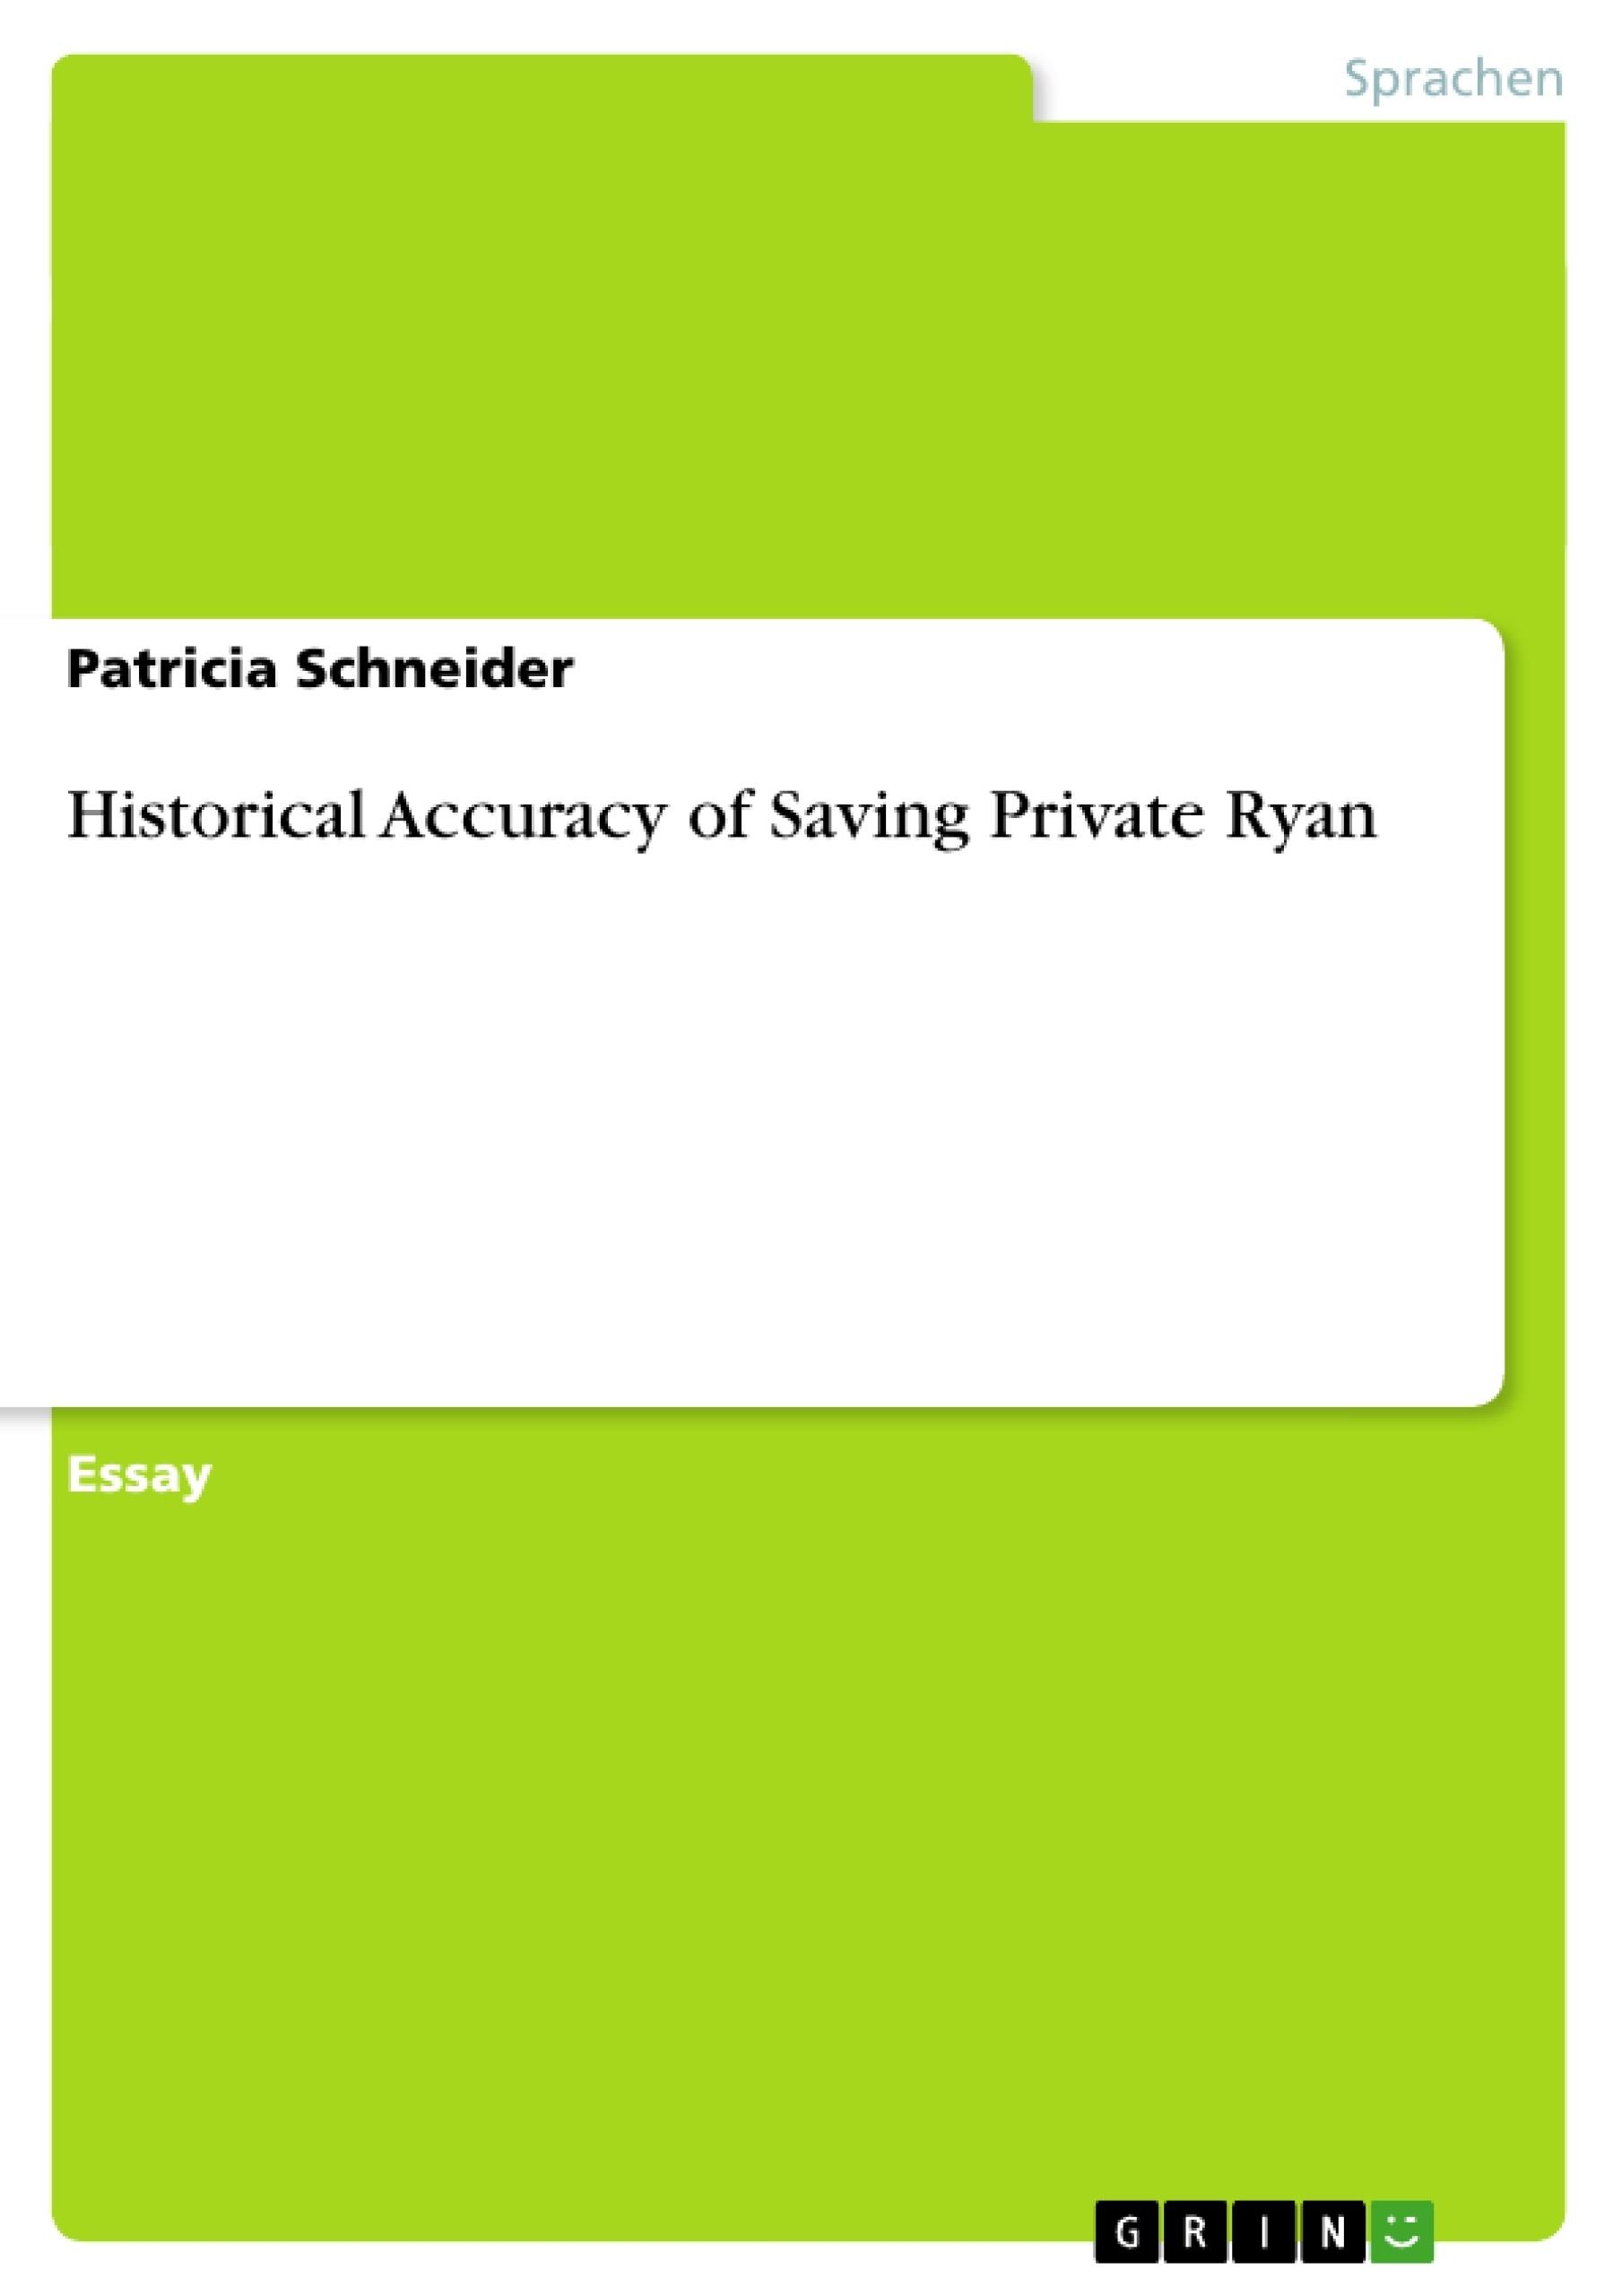 Titel: Historical Accuracy of Saving Private Ryan